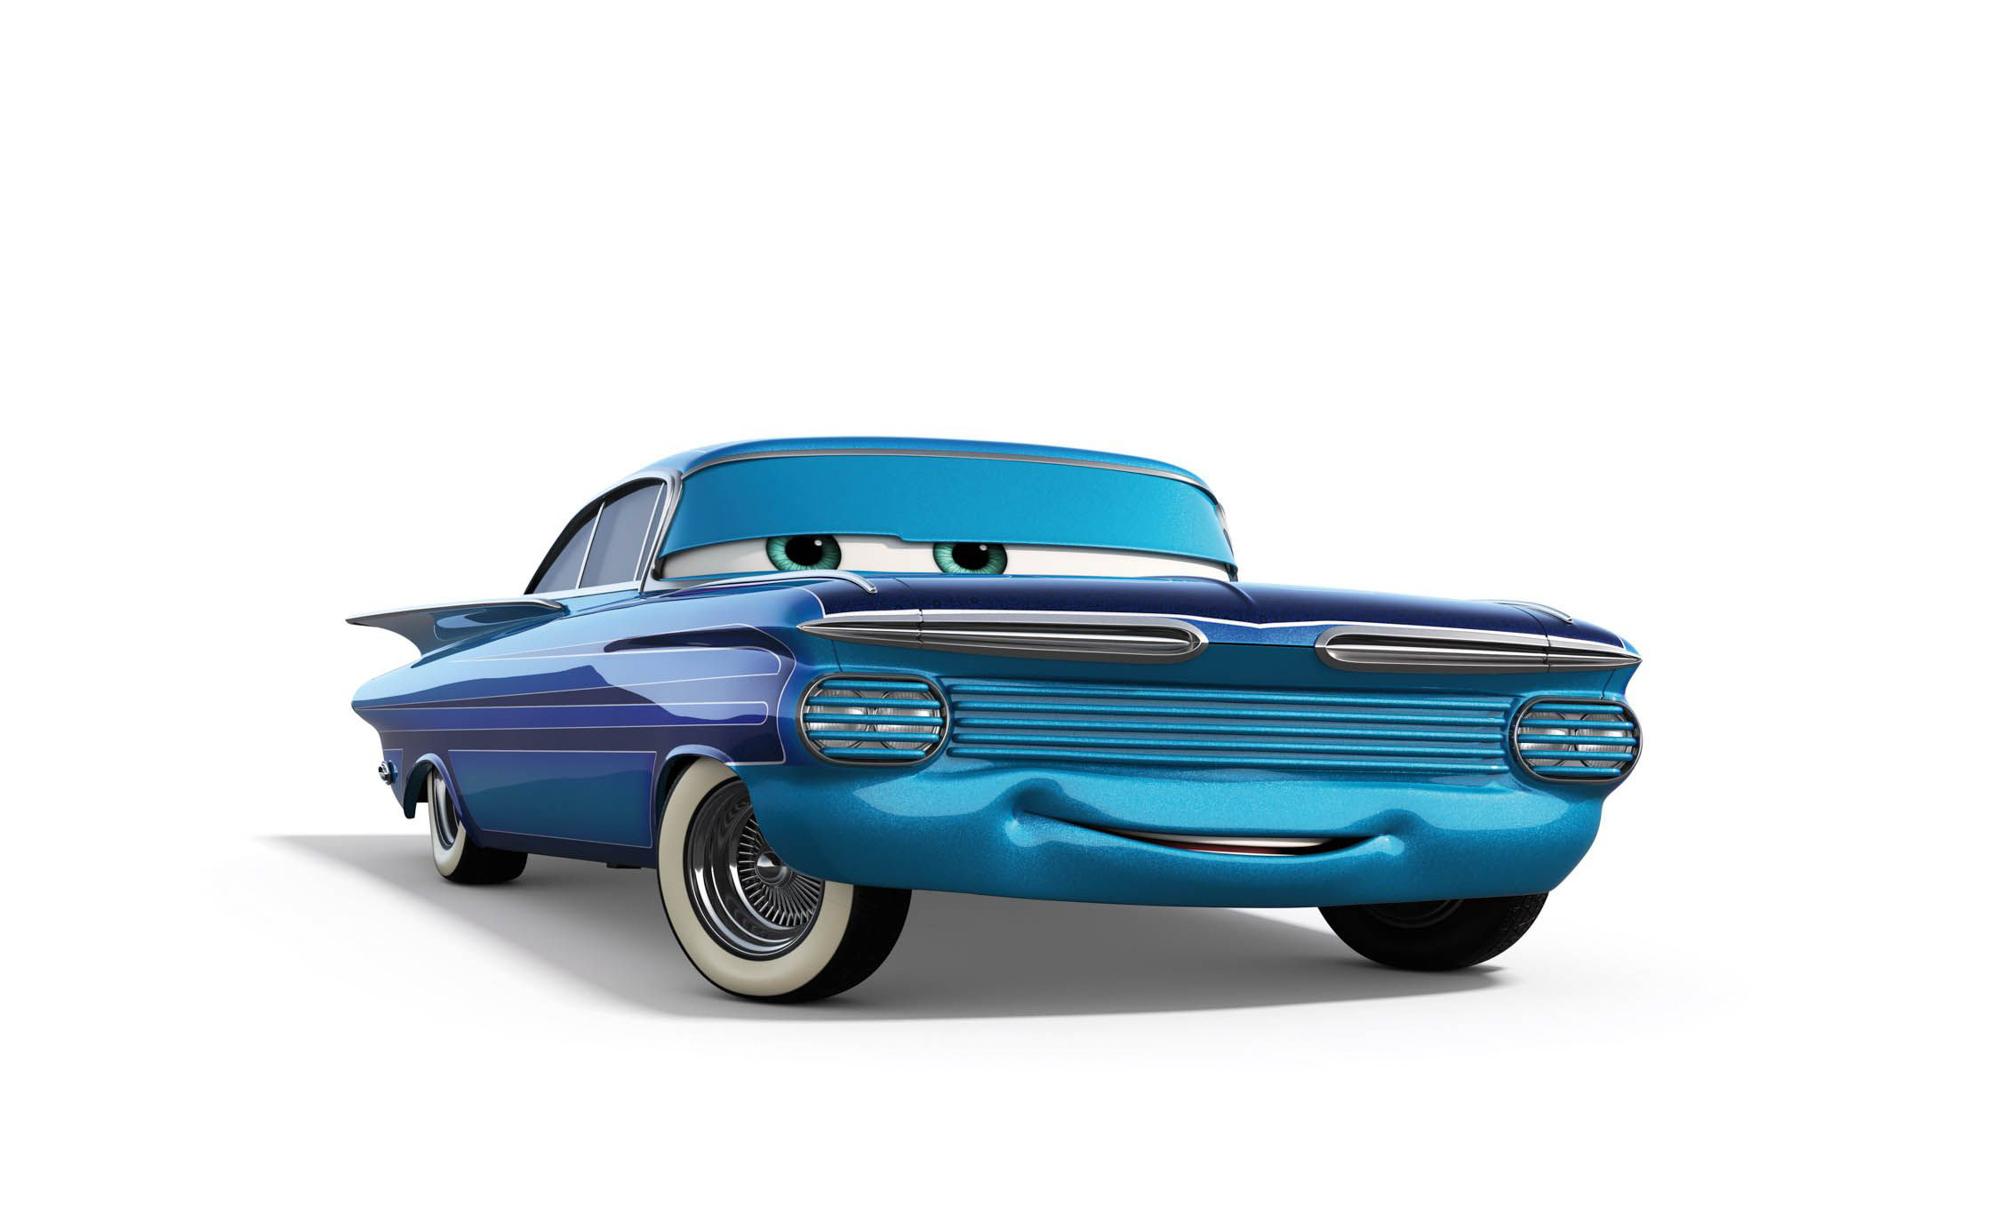 Ramone 1959 Chevy Impala